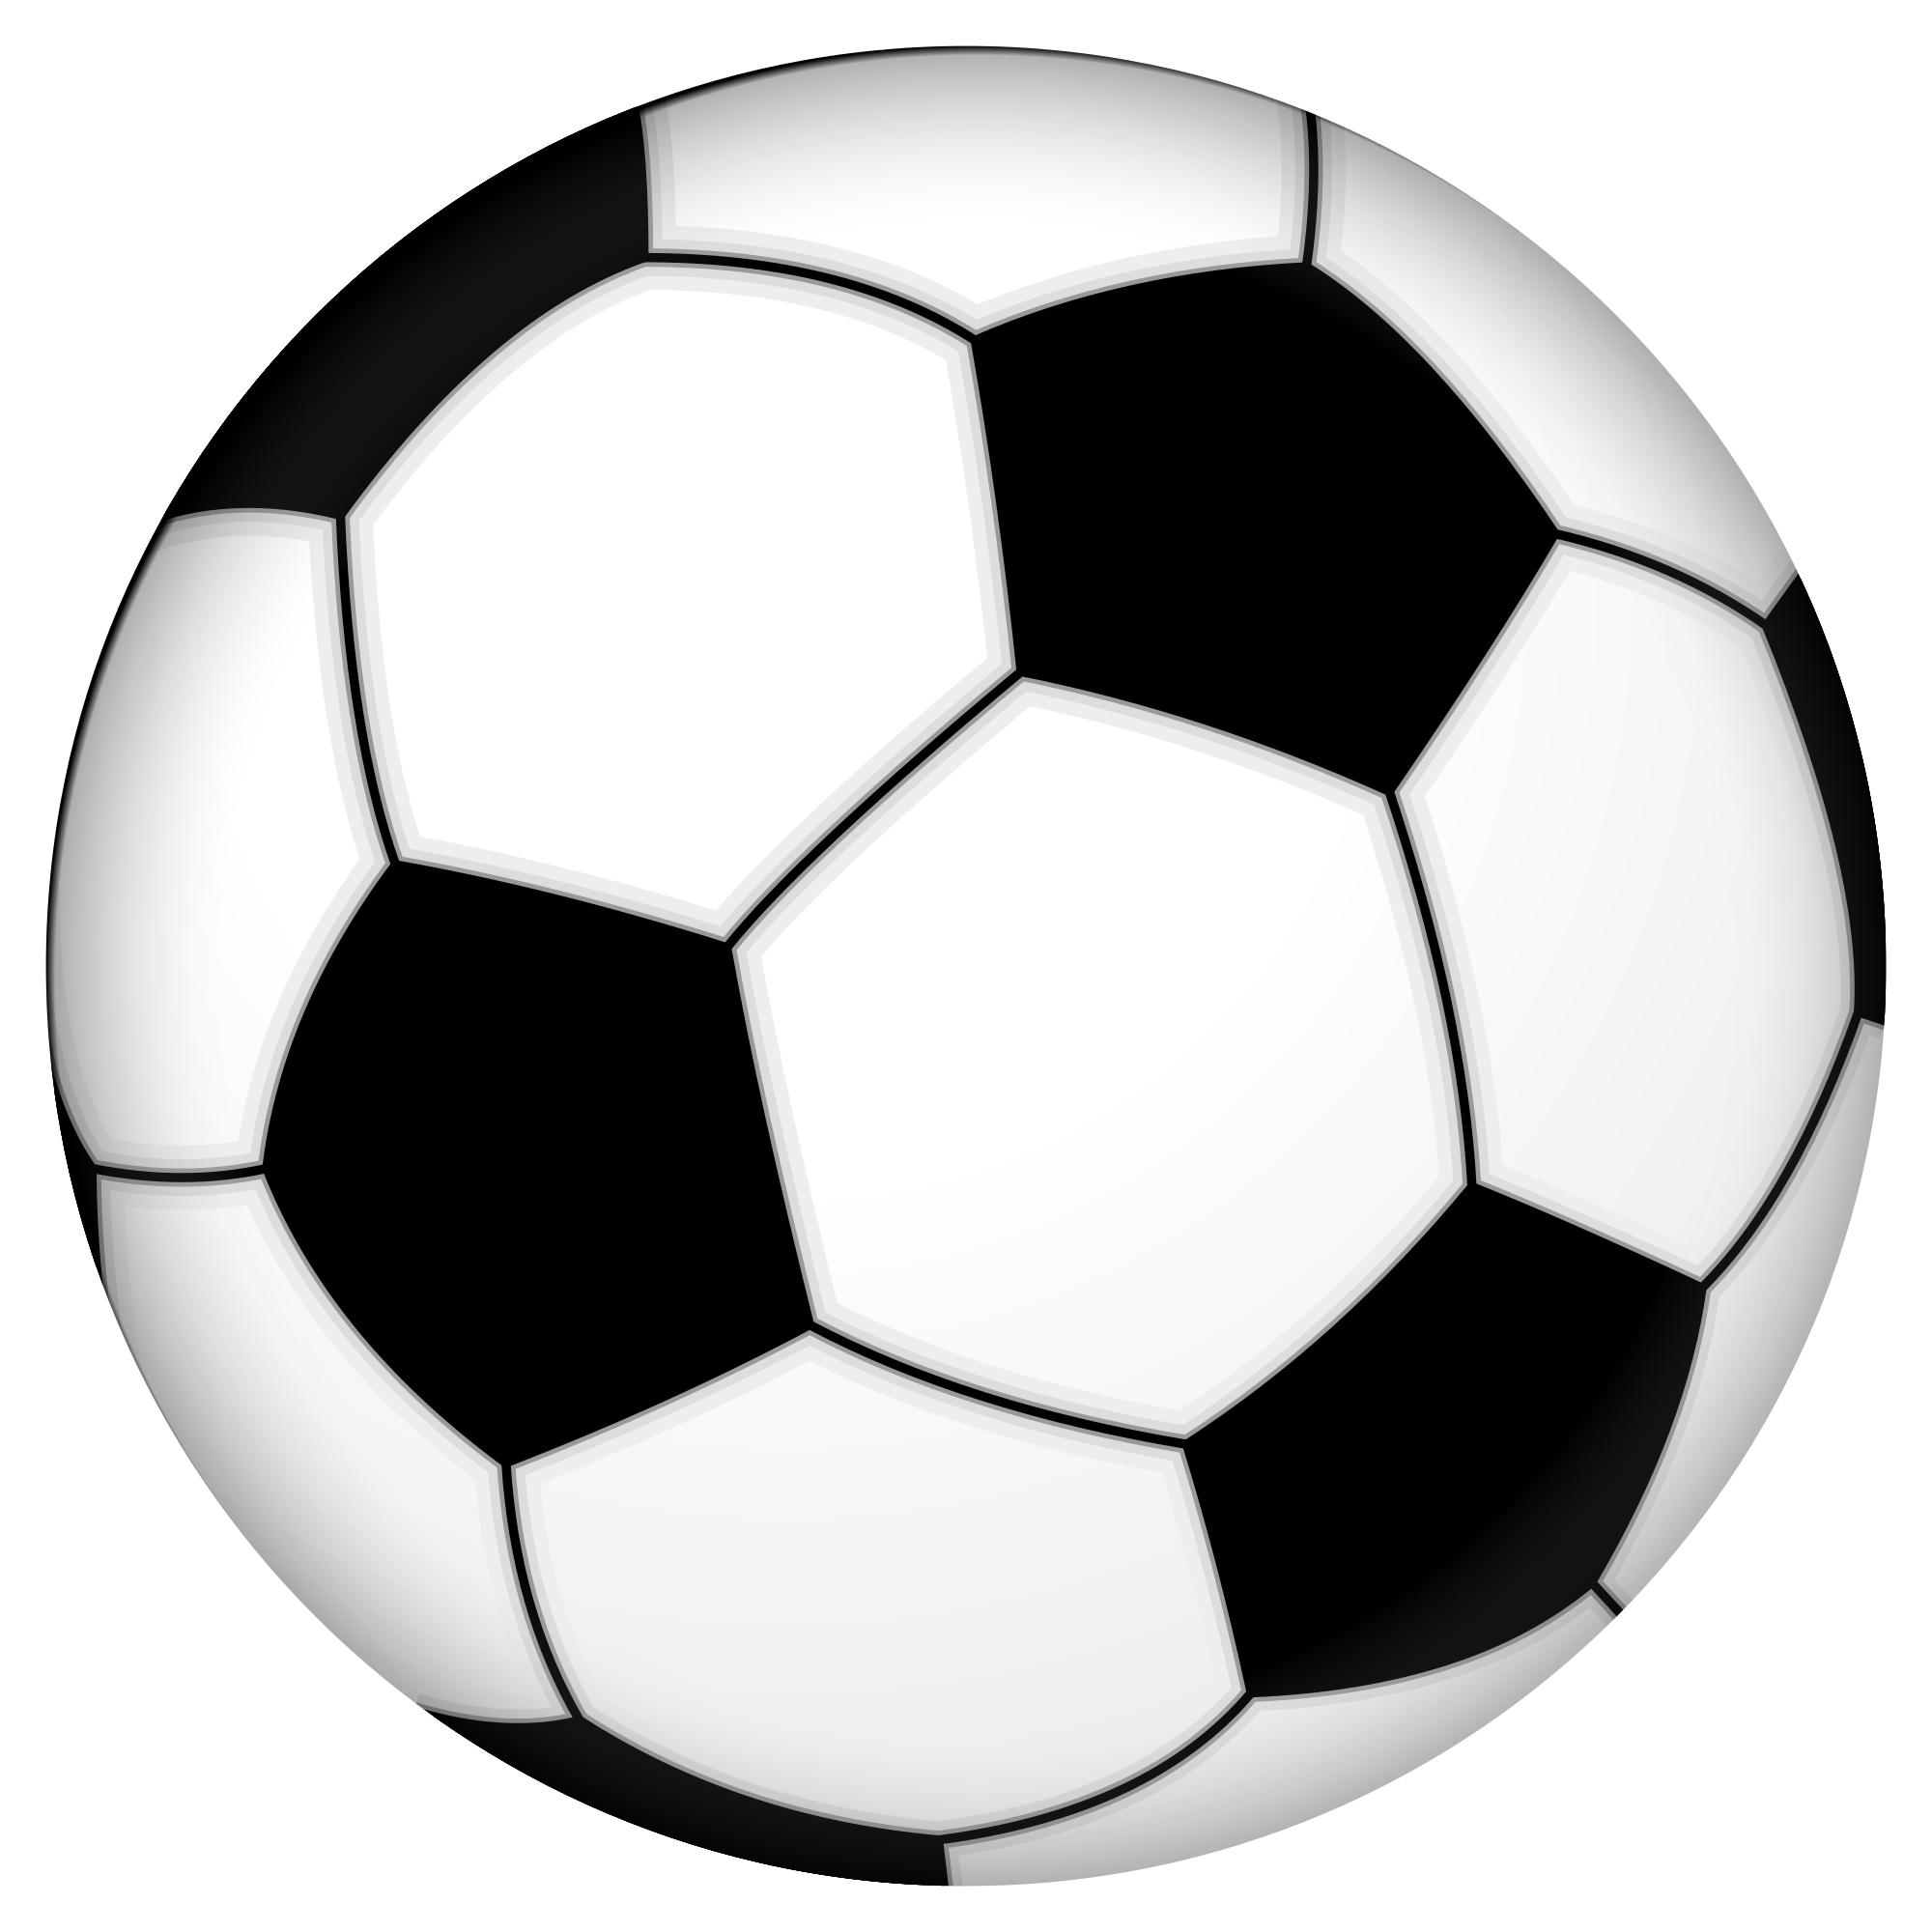 2000x2000 Kicking Soccer Ball Clip Art Free Clipart Images